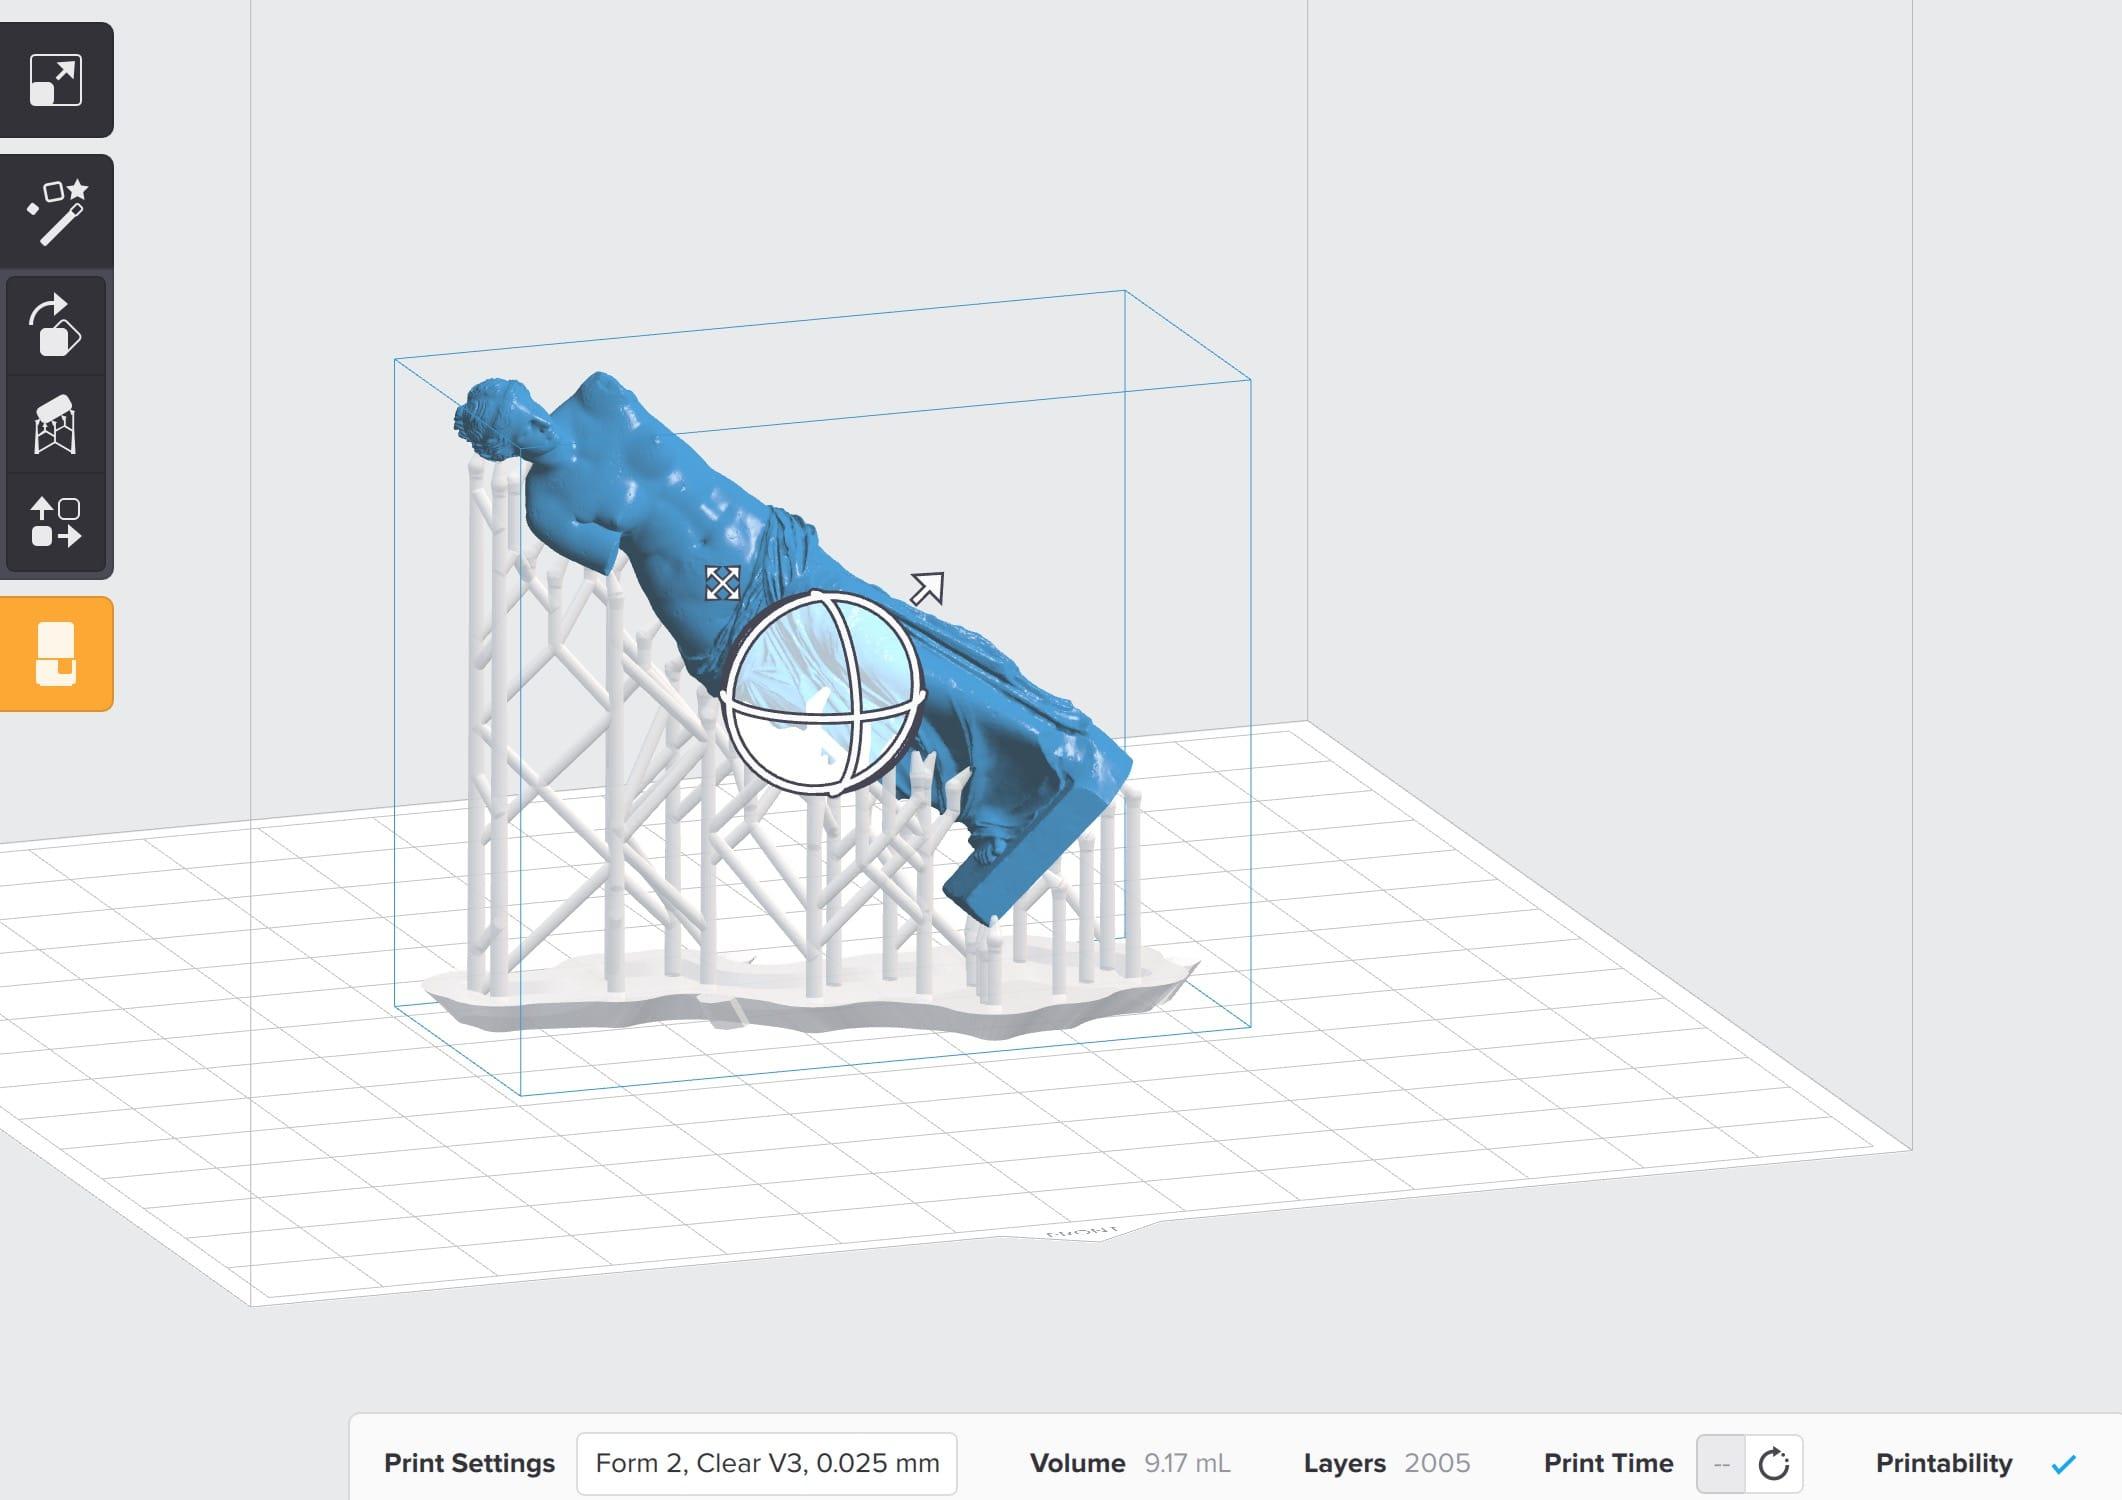 , Hands on with the Form 2 Desktop 3D Printer, Part 1